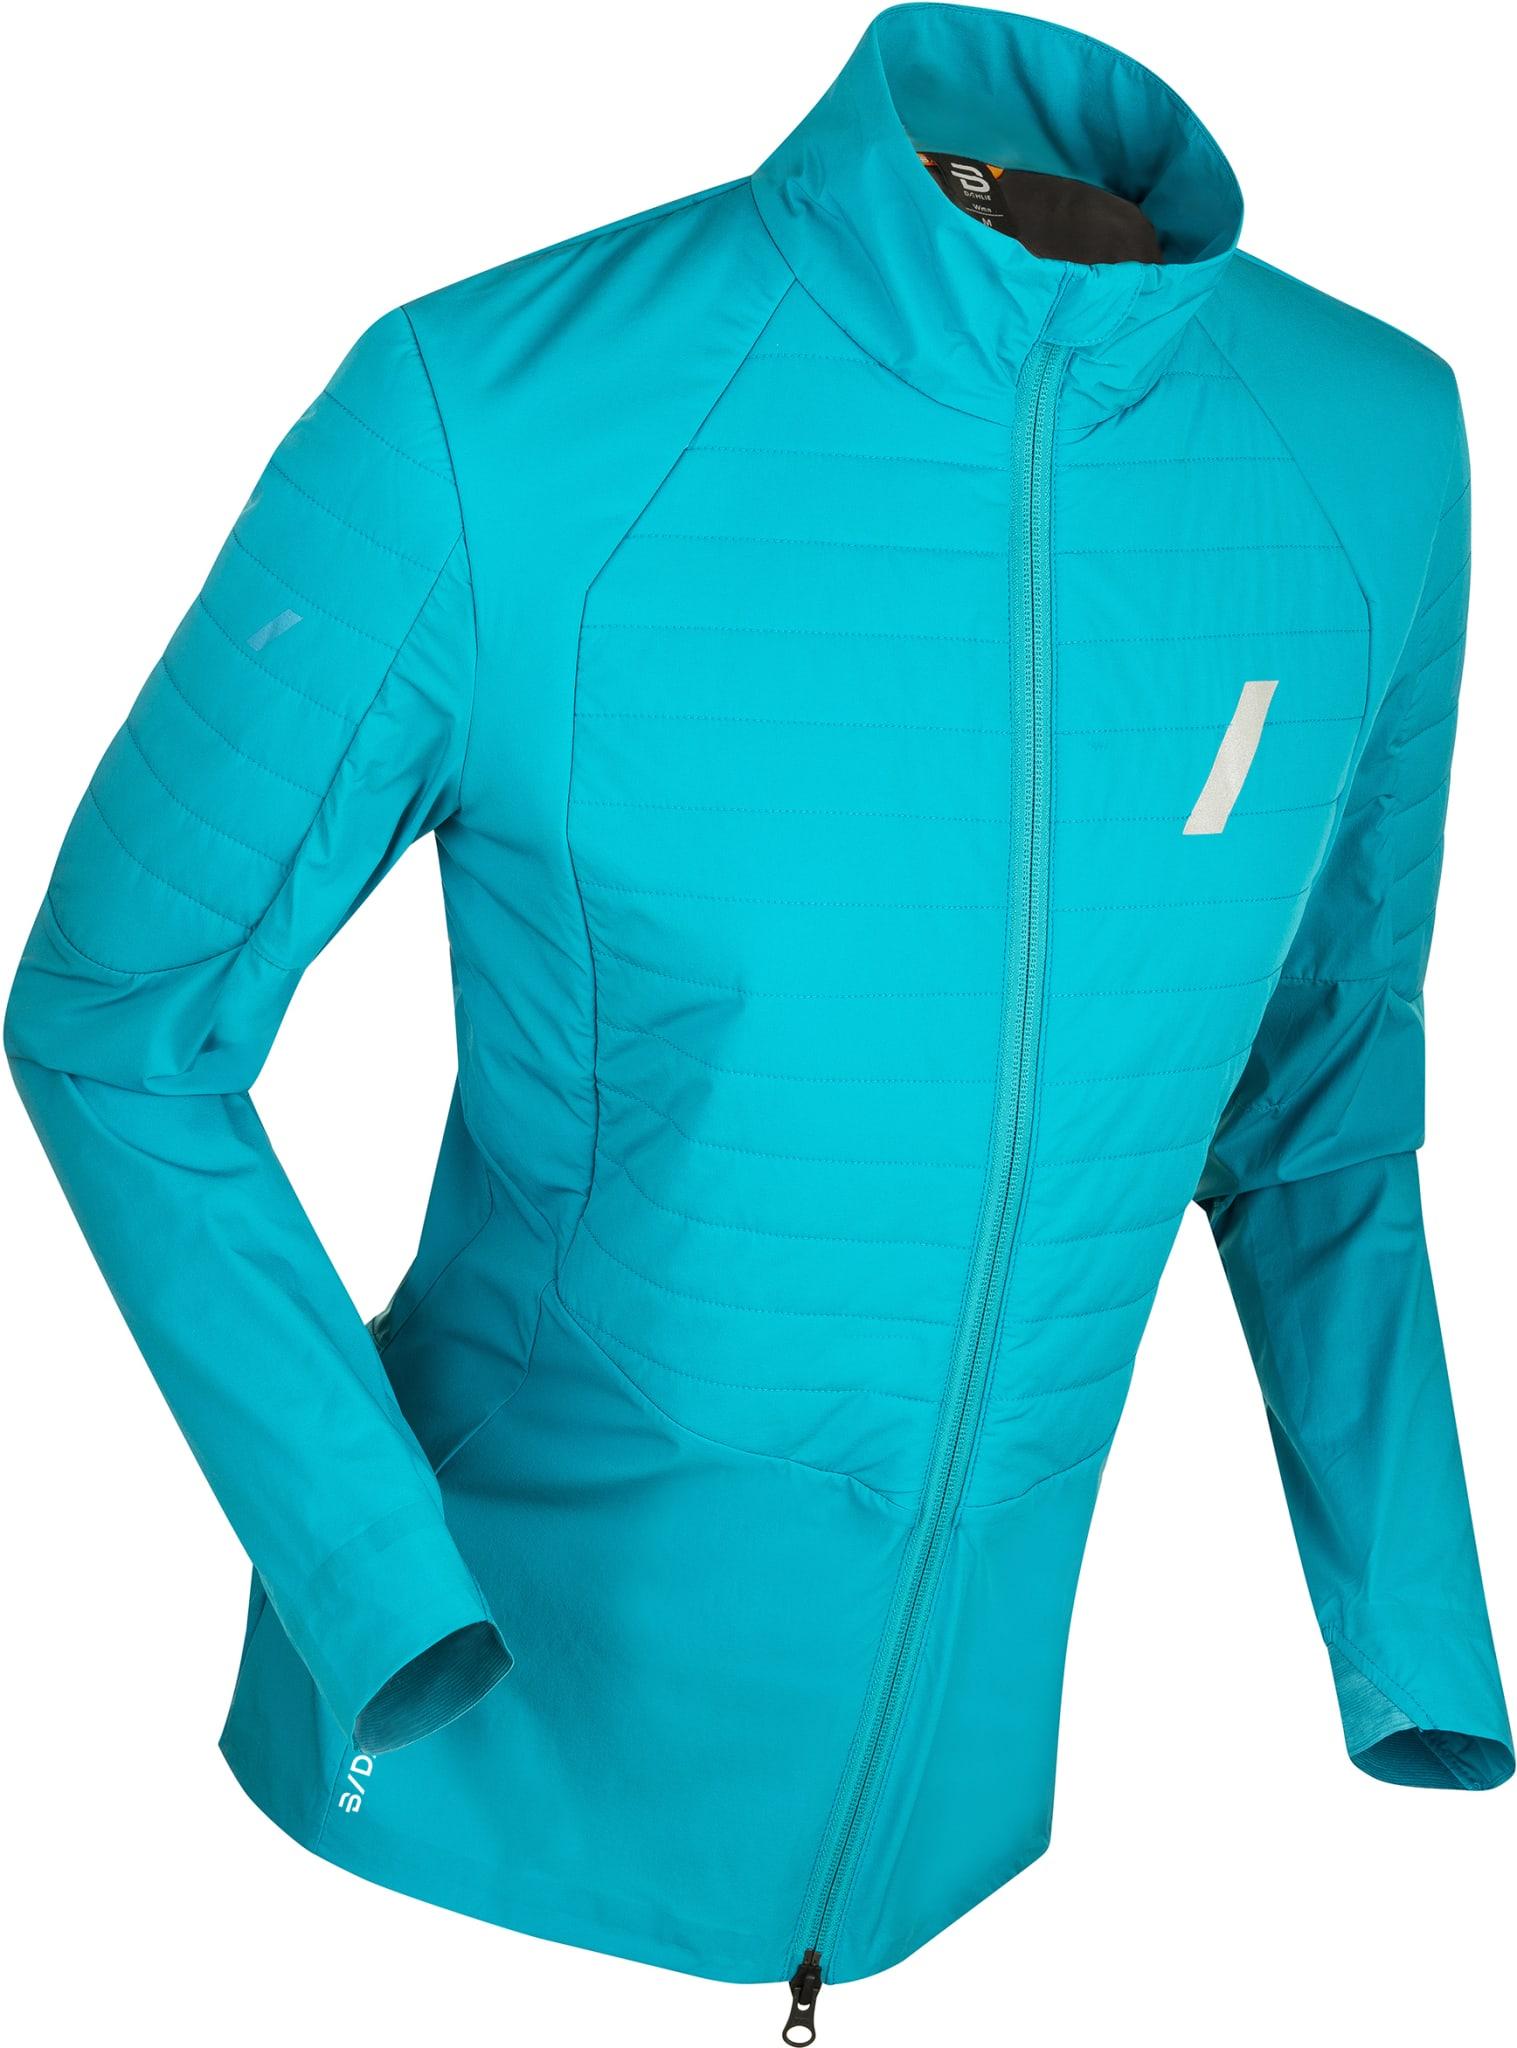 Winter Run Jacket til dame er den perfekte løpejakka ved kalde temperaturer